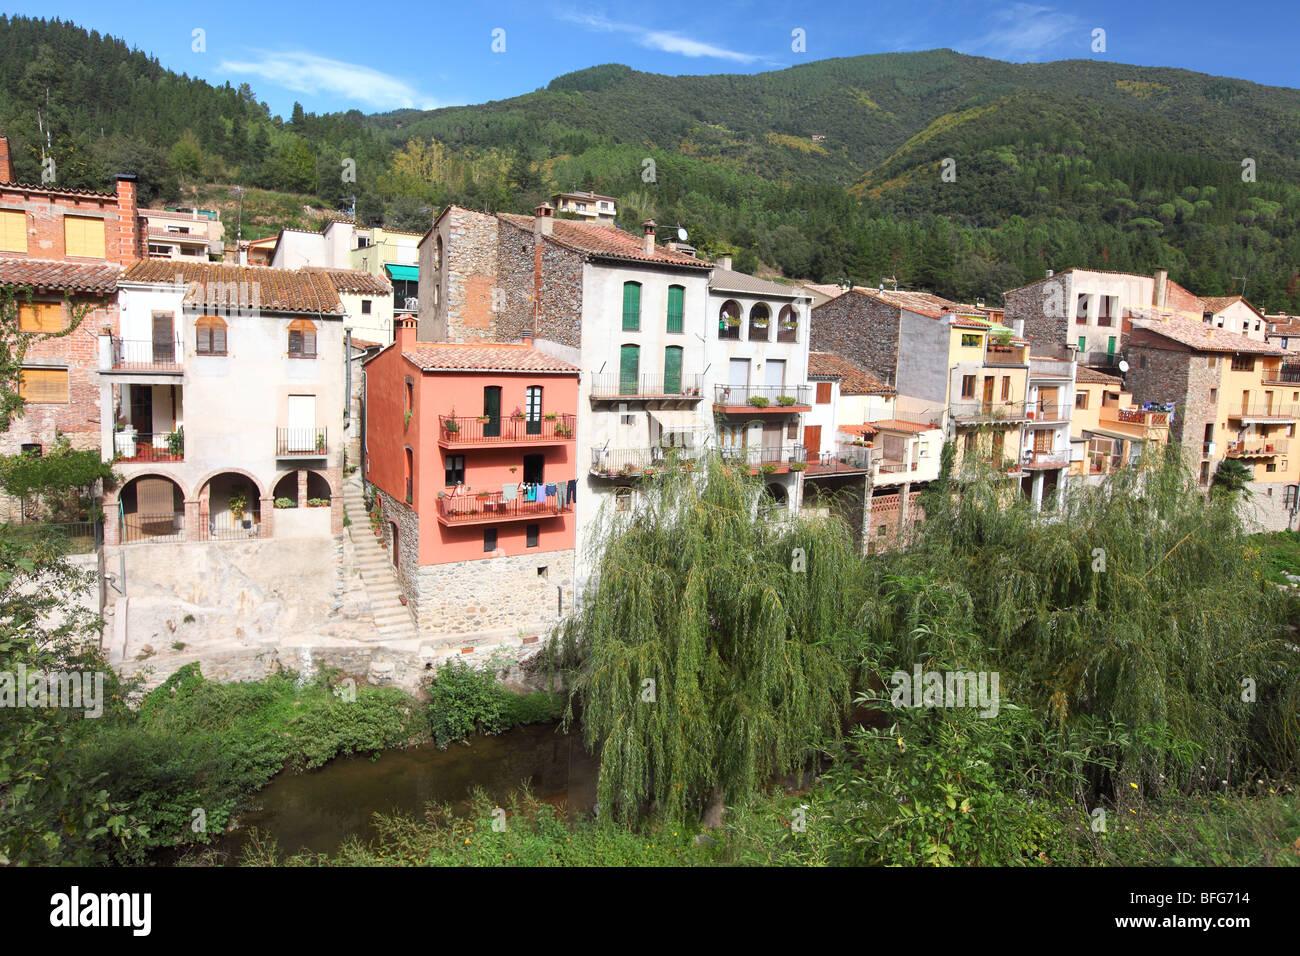 Spain, Cataluna, Catalonia, Catalunya, Costa Brava, in the mountains mountain village of Osor - Stock Image